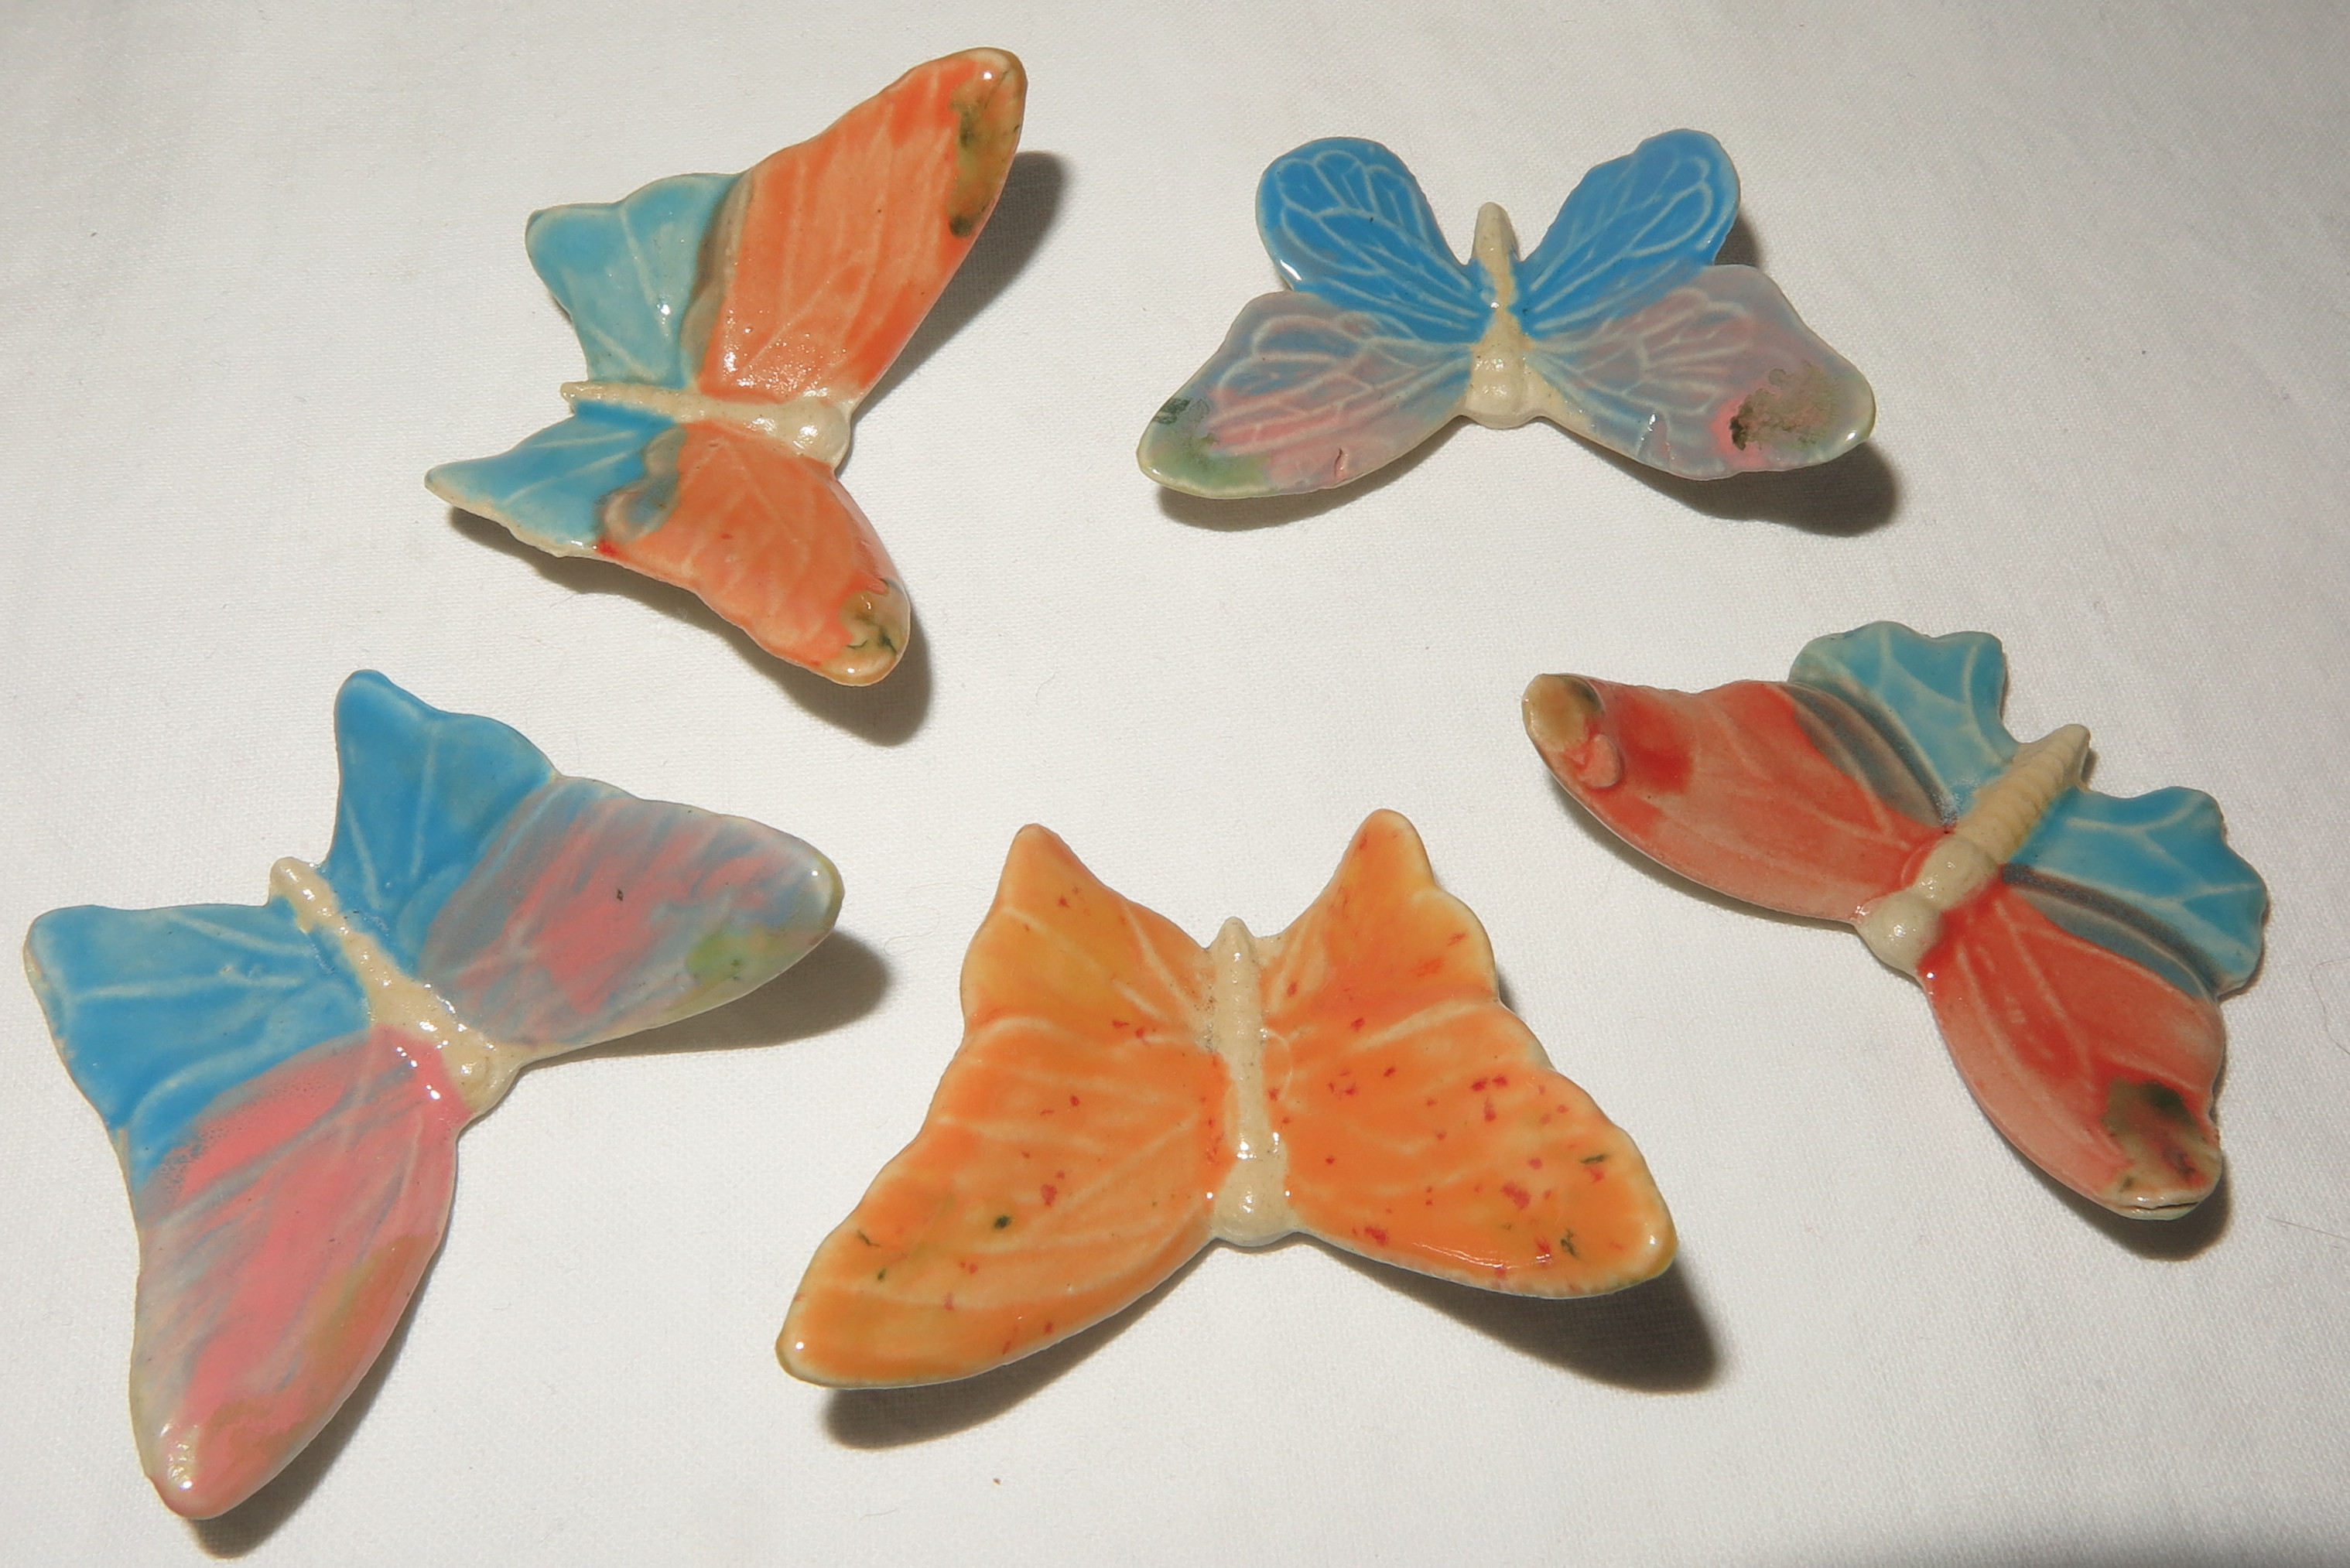 5 Schmetterlinge bunt gemischt, zum Legen